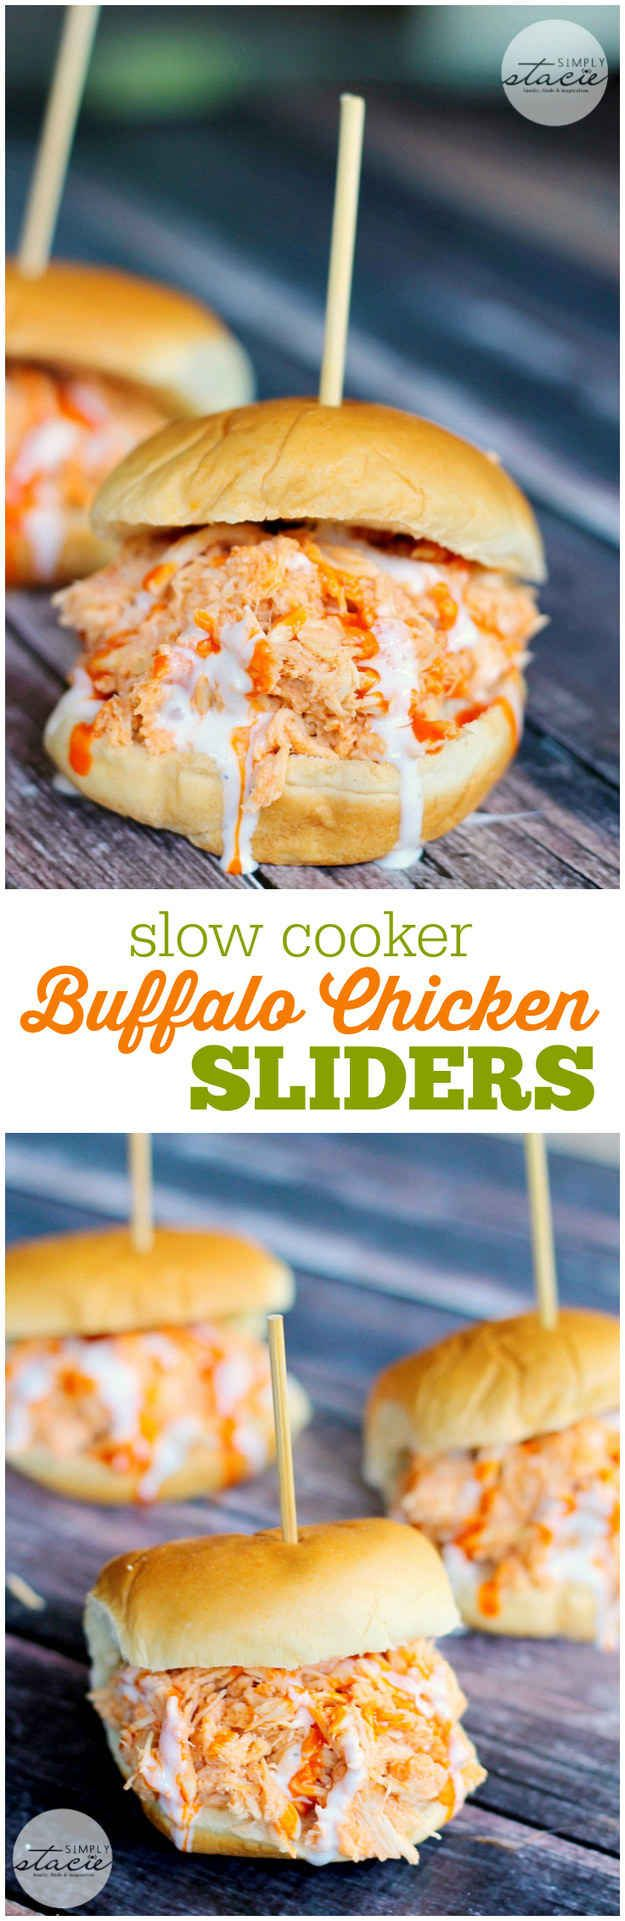 Slow Cooker Buffalo Chicken Sliders #gamedaygrub